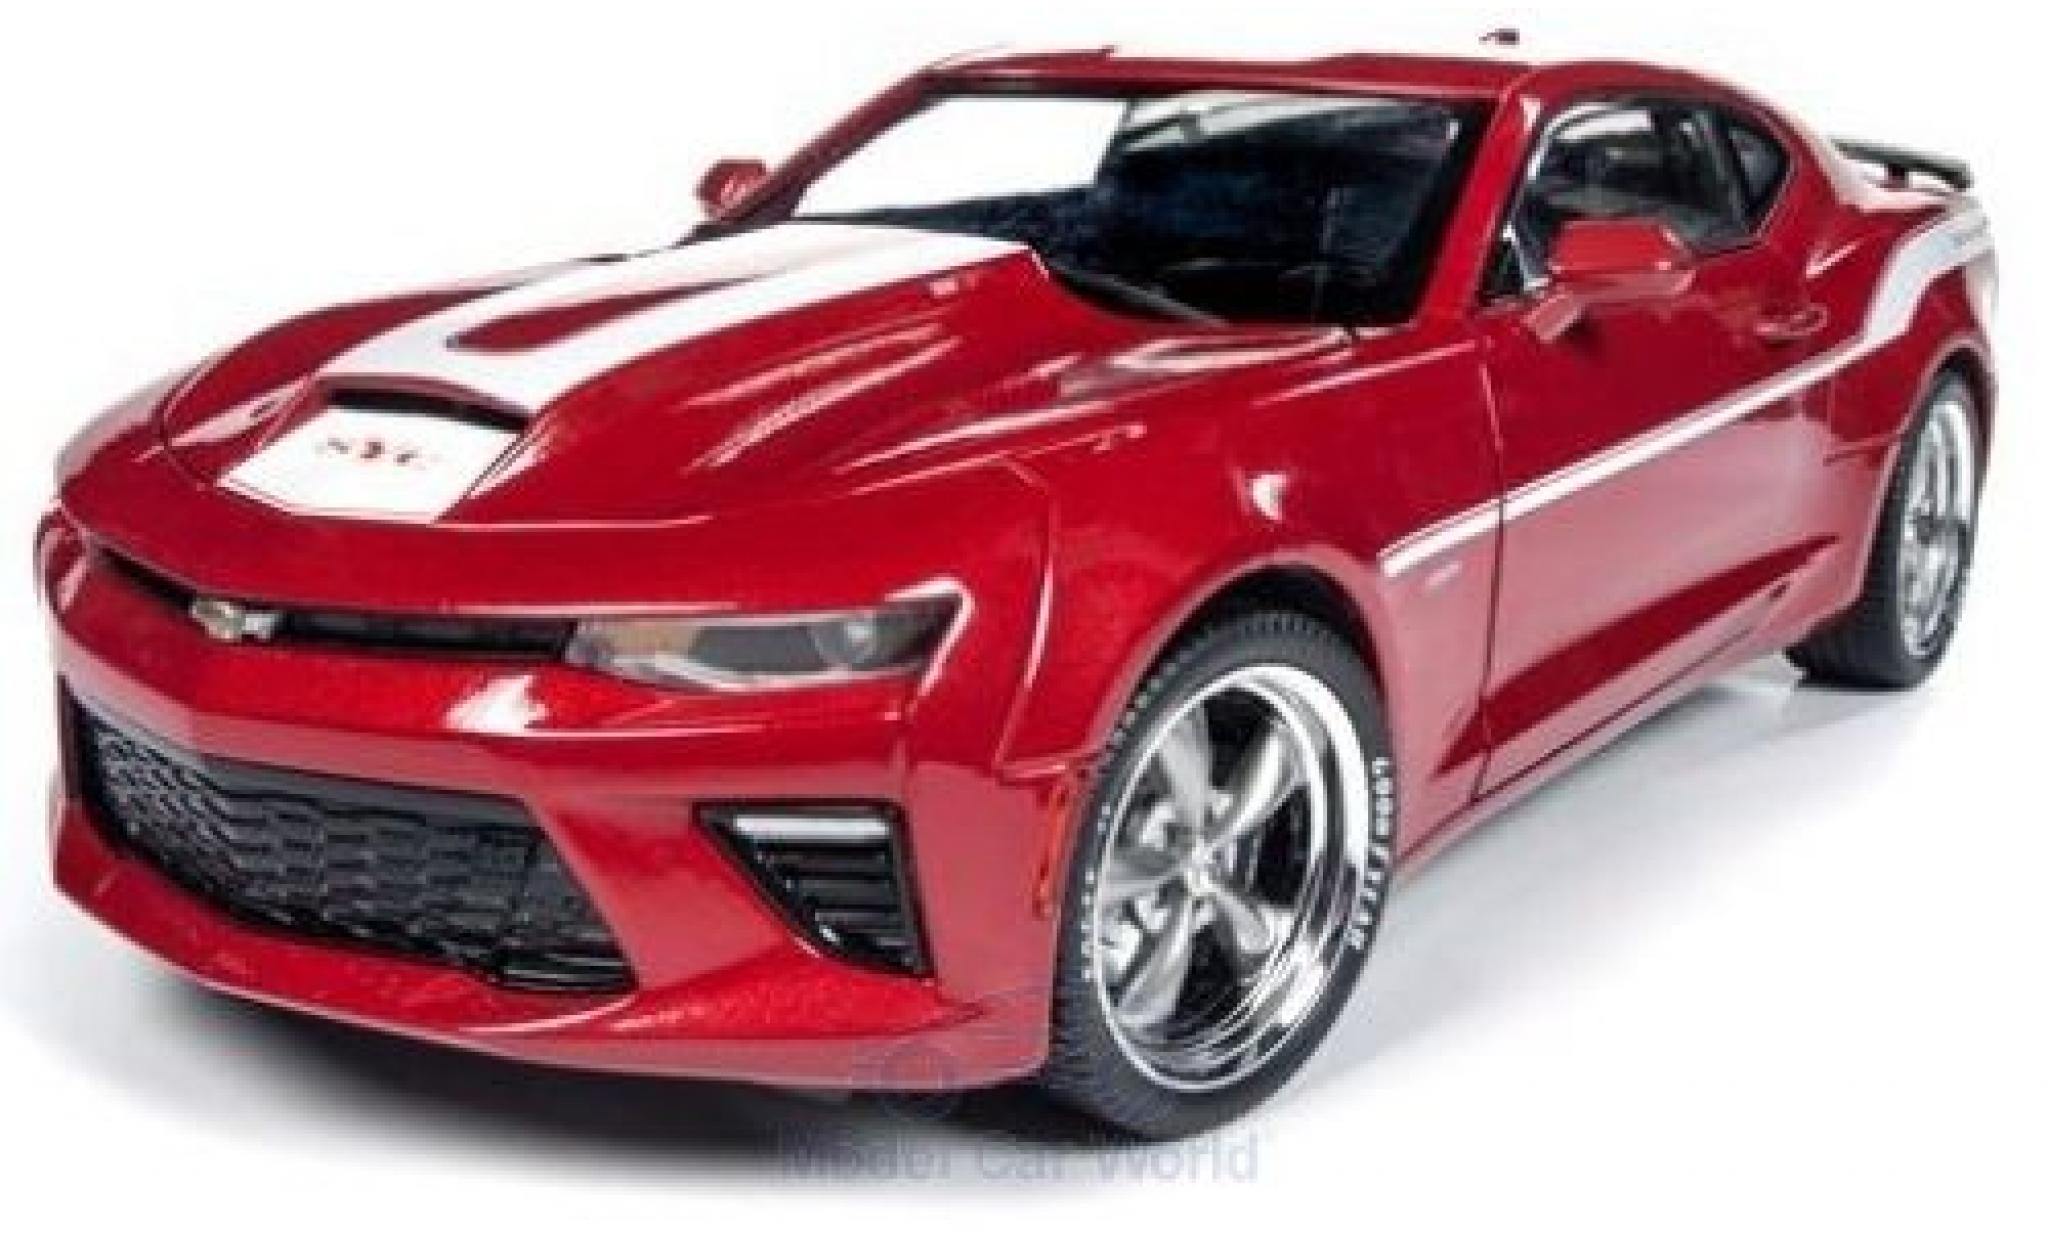 Chevrolet Camaro 1/18 Auto World Yenko rouge/blanche 2017